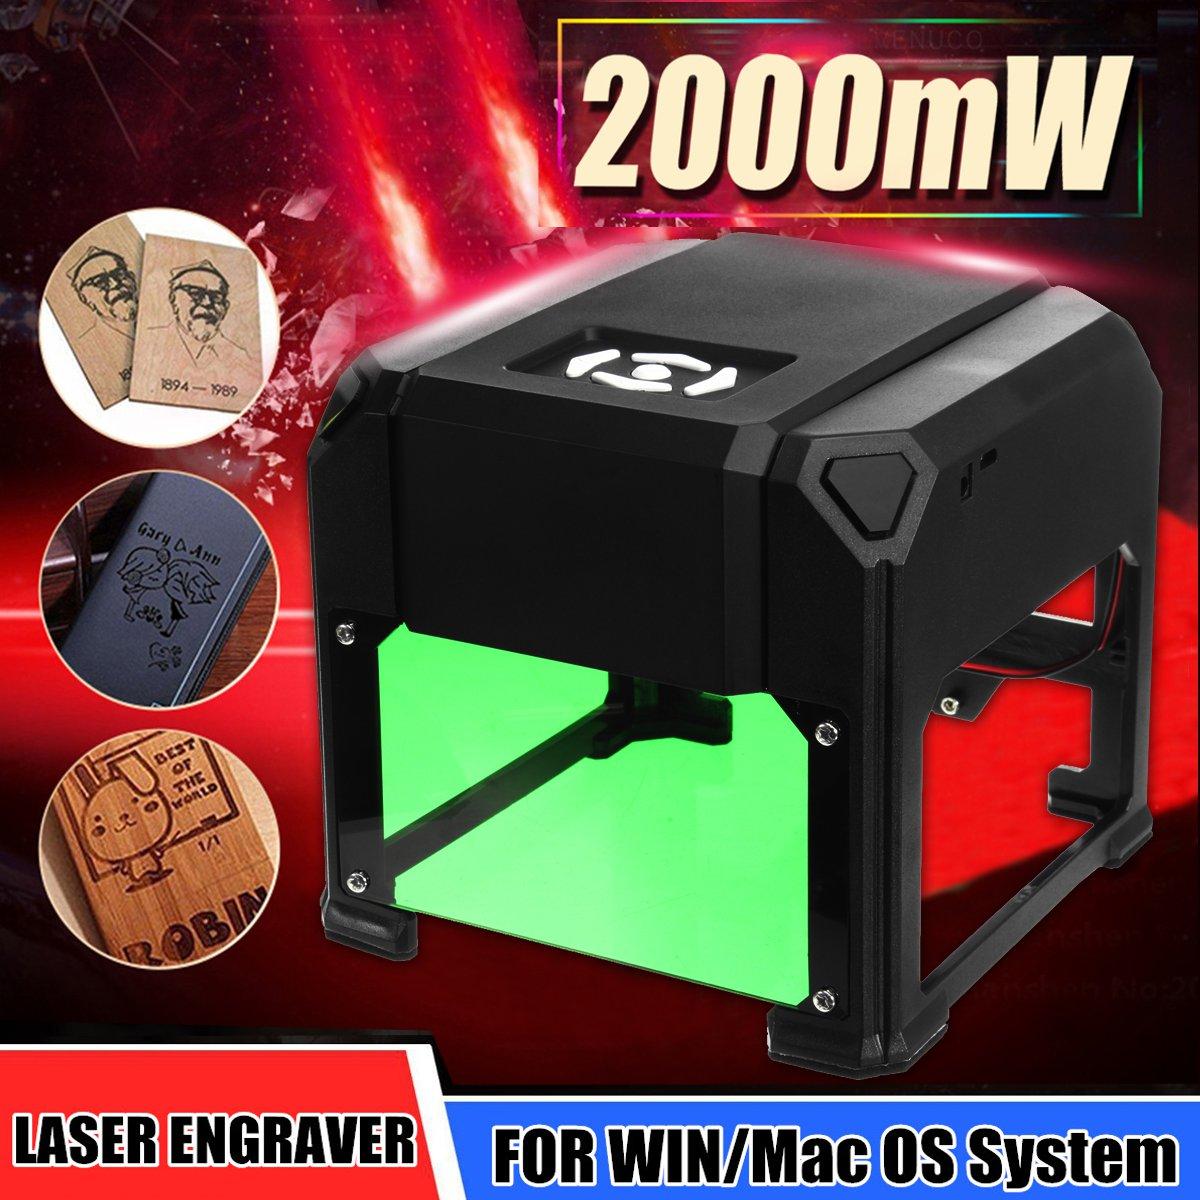 New Upgraded 2000mW USB Laser Engraver Printer Cutter